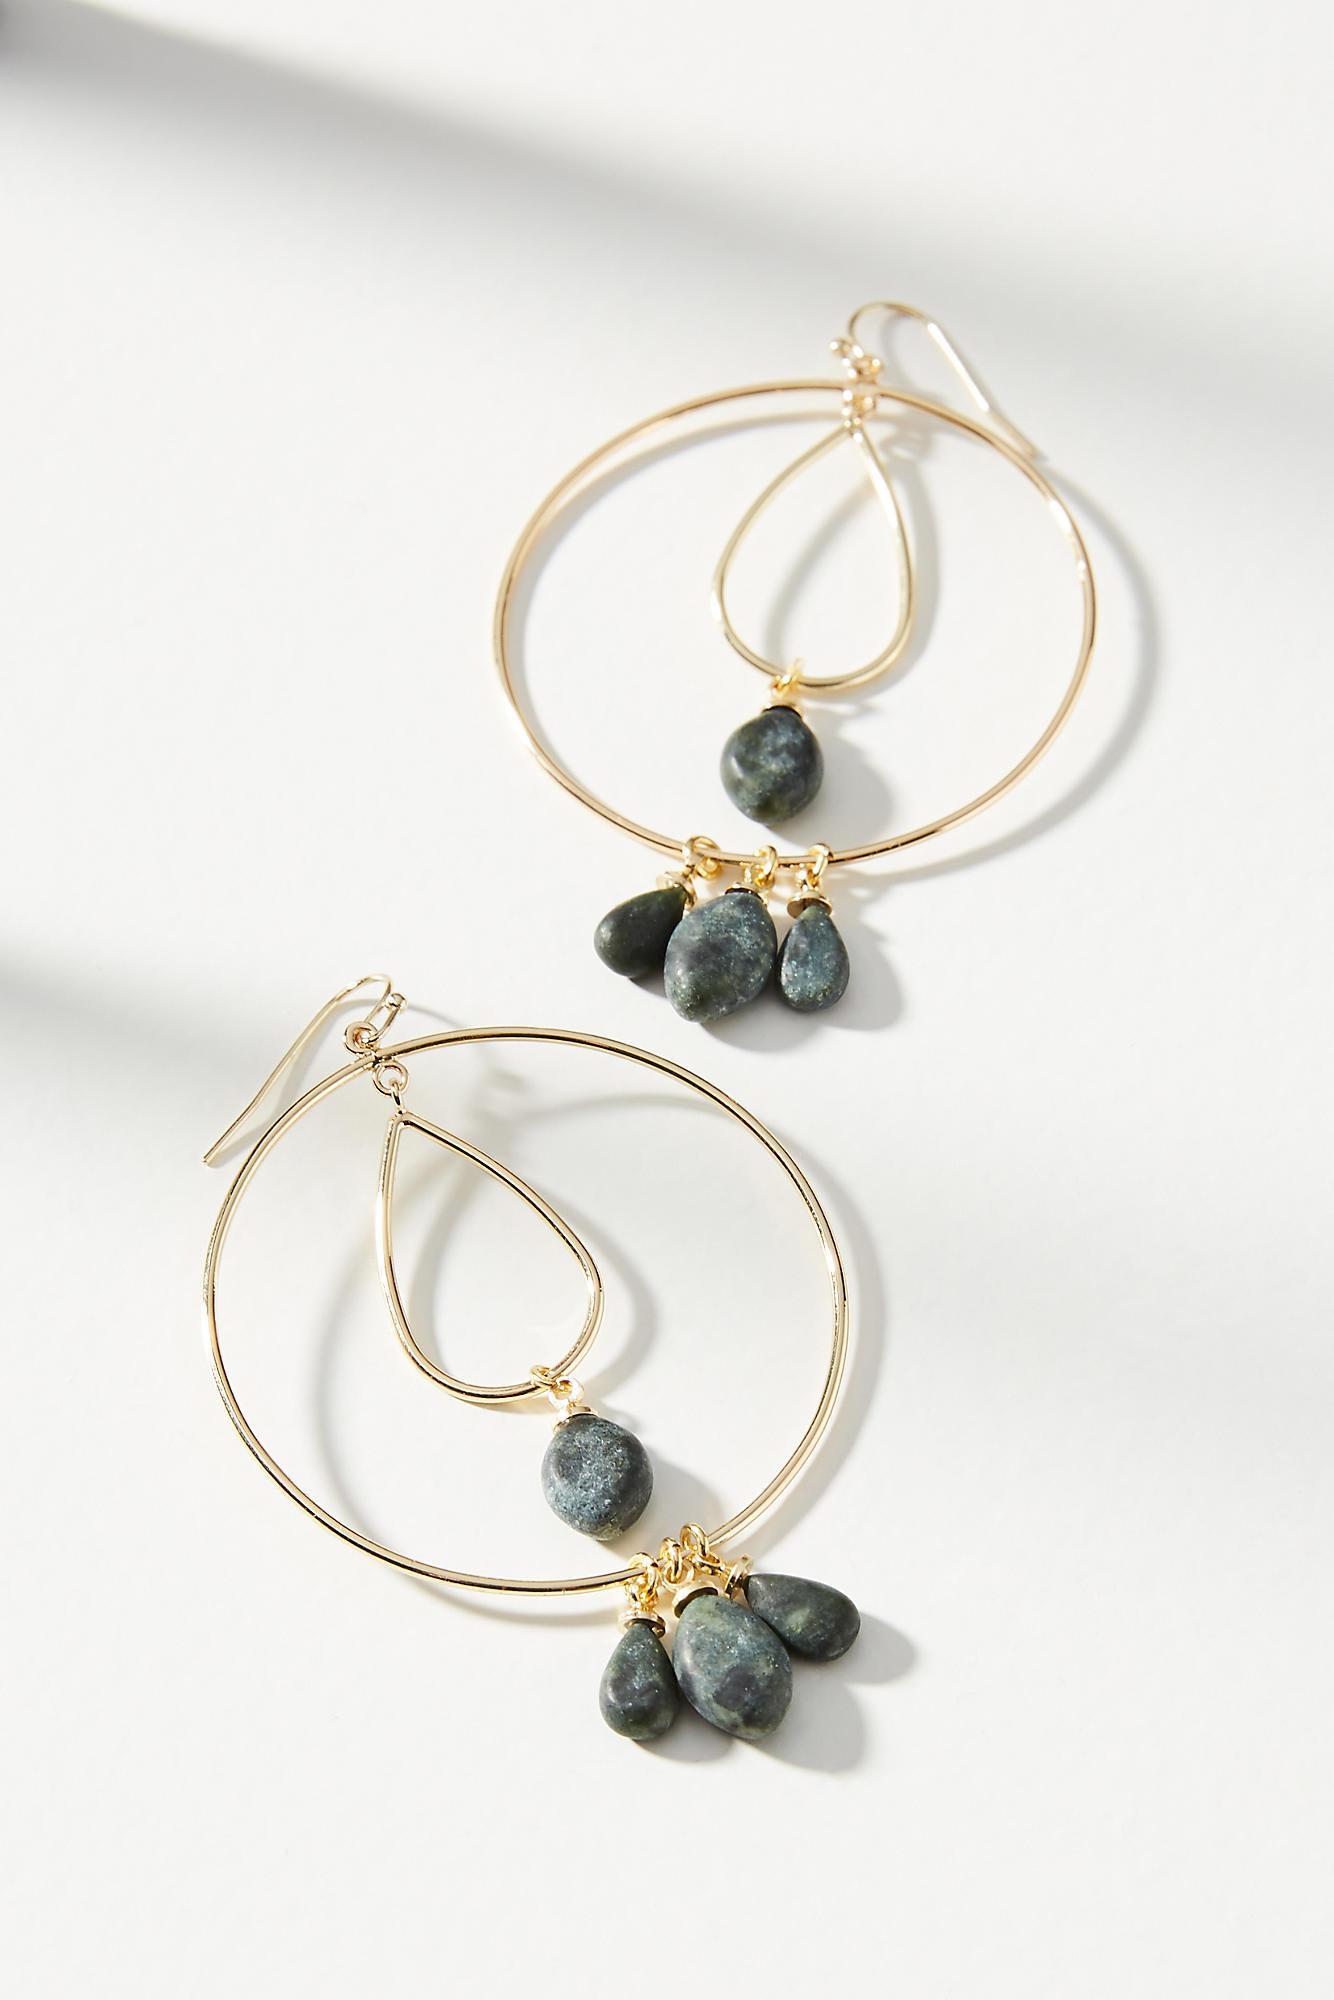 Anthropologie Tumbled Stone Double Hoop Earrings yuWmcKCP